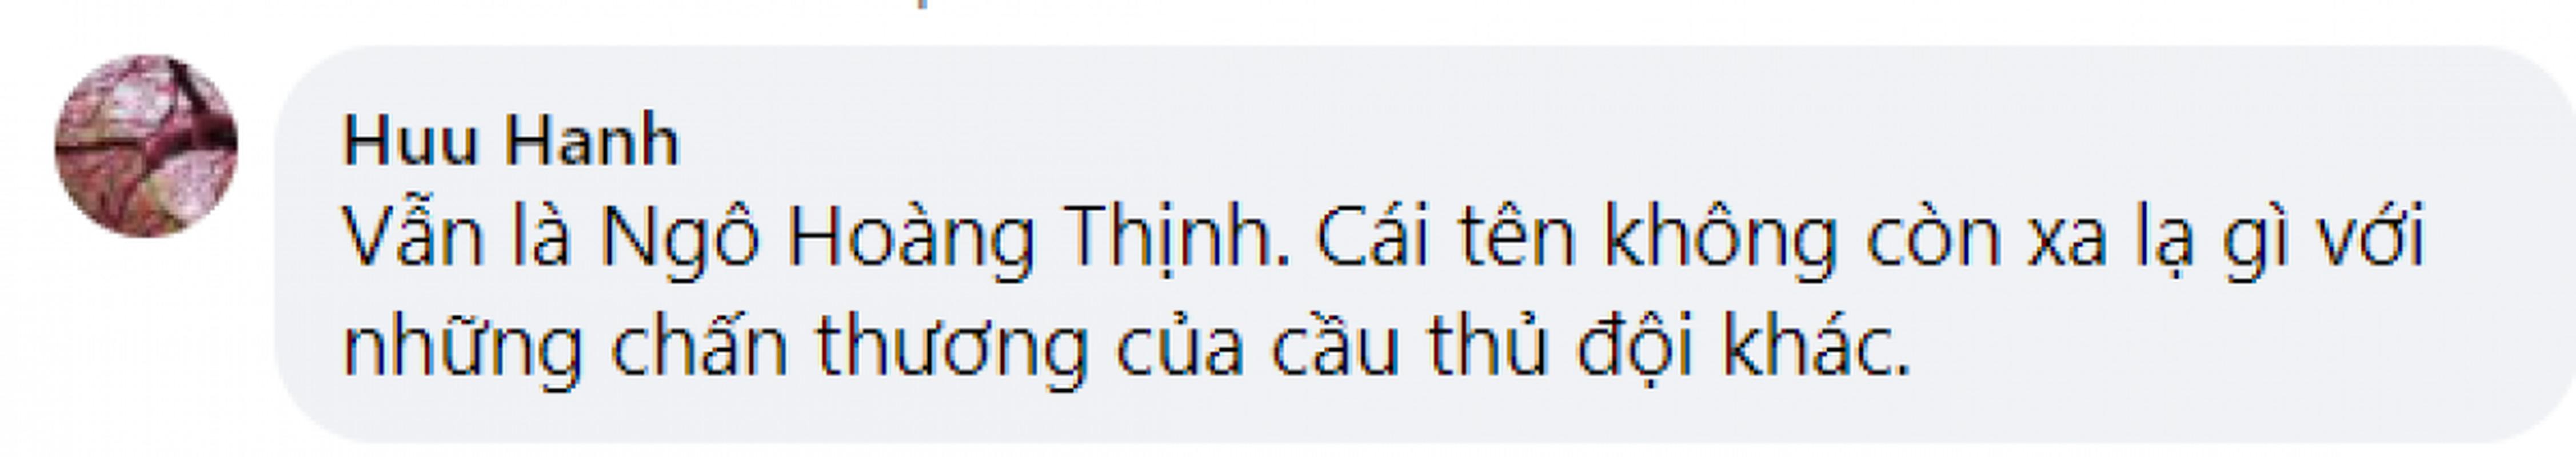 Do Hung Dung gay chan, netizen trut gian len Facebook Ngo Hoang Thinh-Hinh-5